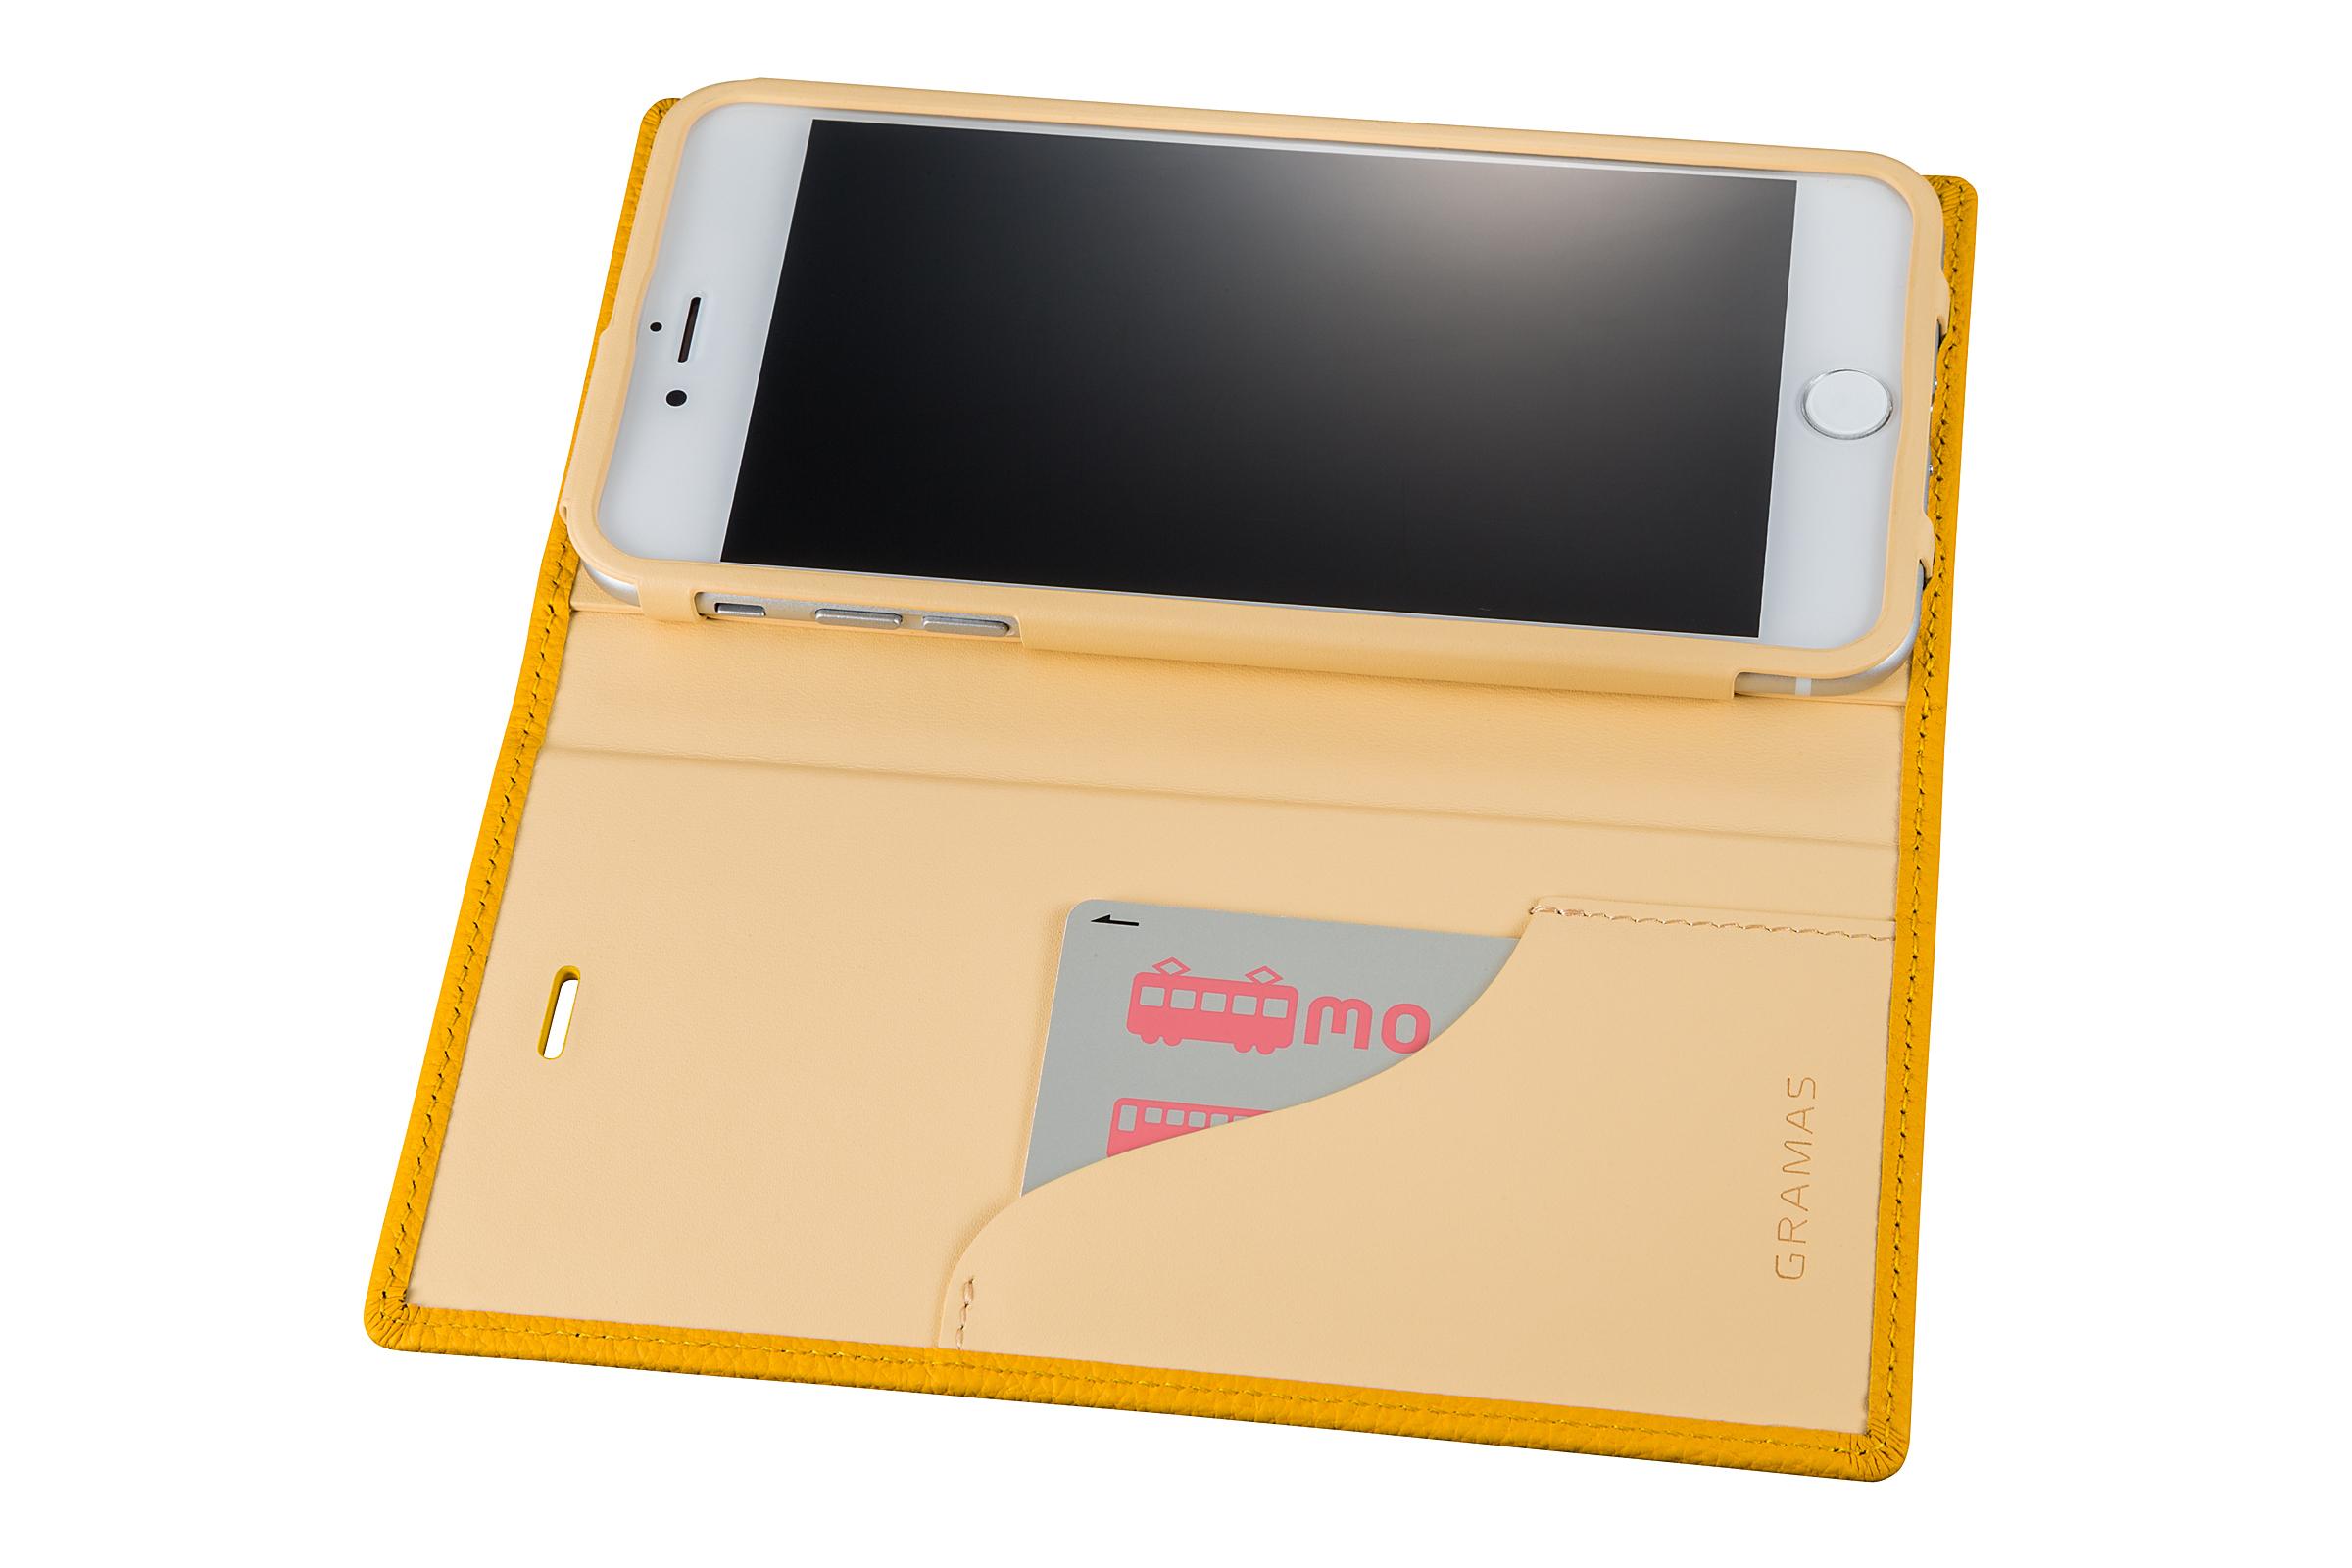 GRAMAS Shrunken-calf Full Leather Case for iPhone 7 Plus(Yellow) シュランケンカーフ 手帳型フルレザーケース - 画像4